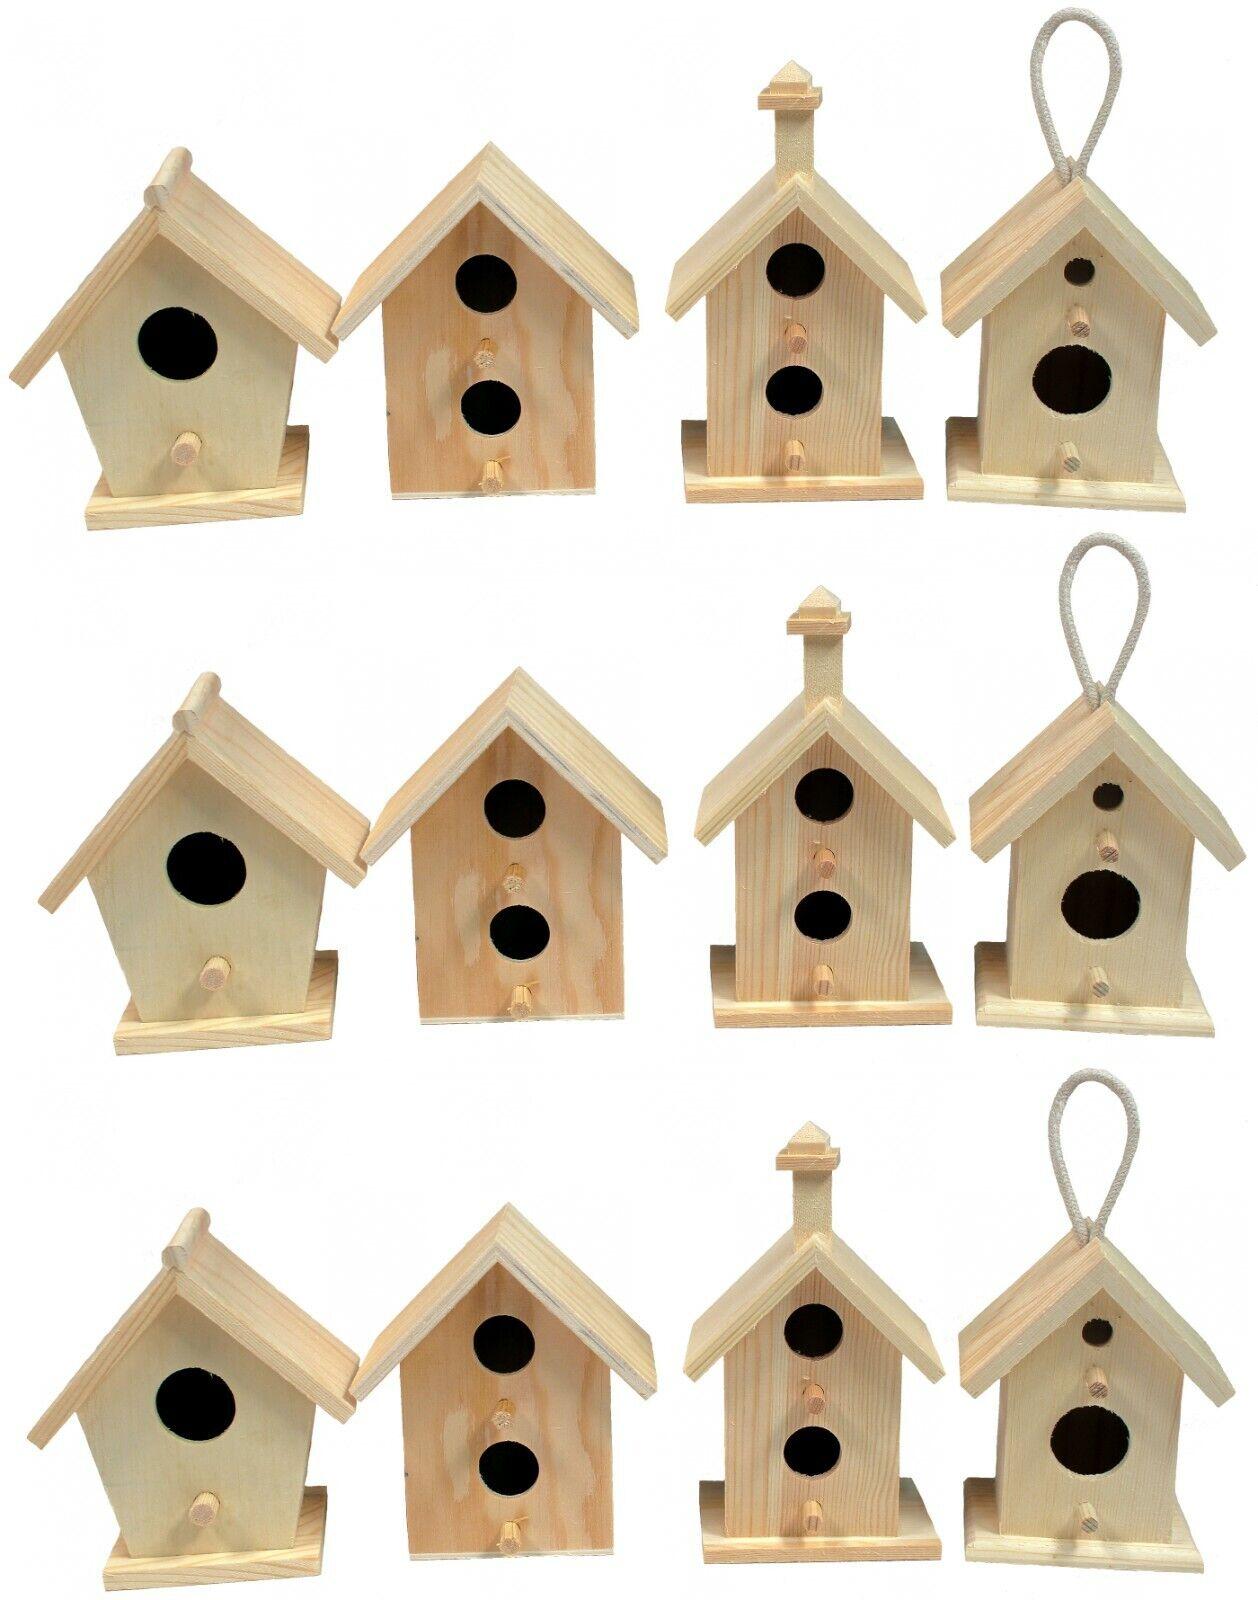 Creative Hobbies 12 Pack of Wooden Bird Houses To Paint, DIY Design Your Own Bird & Wildlife Accessories